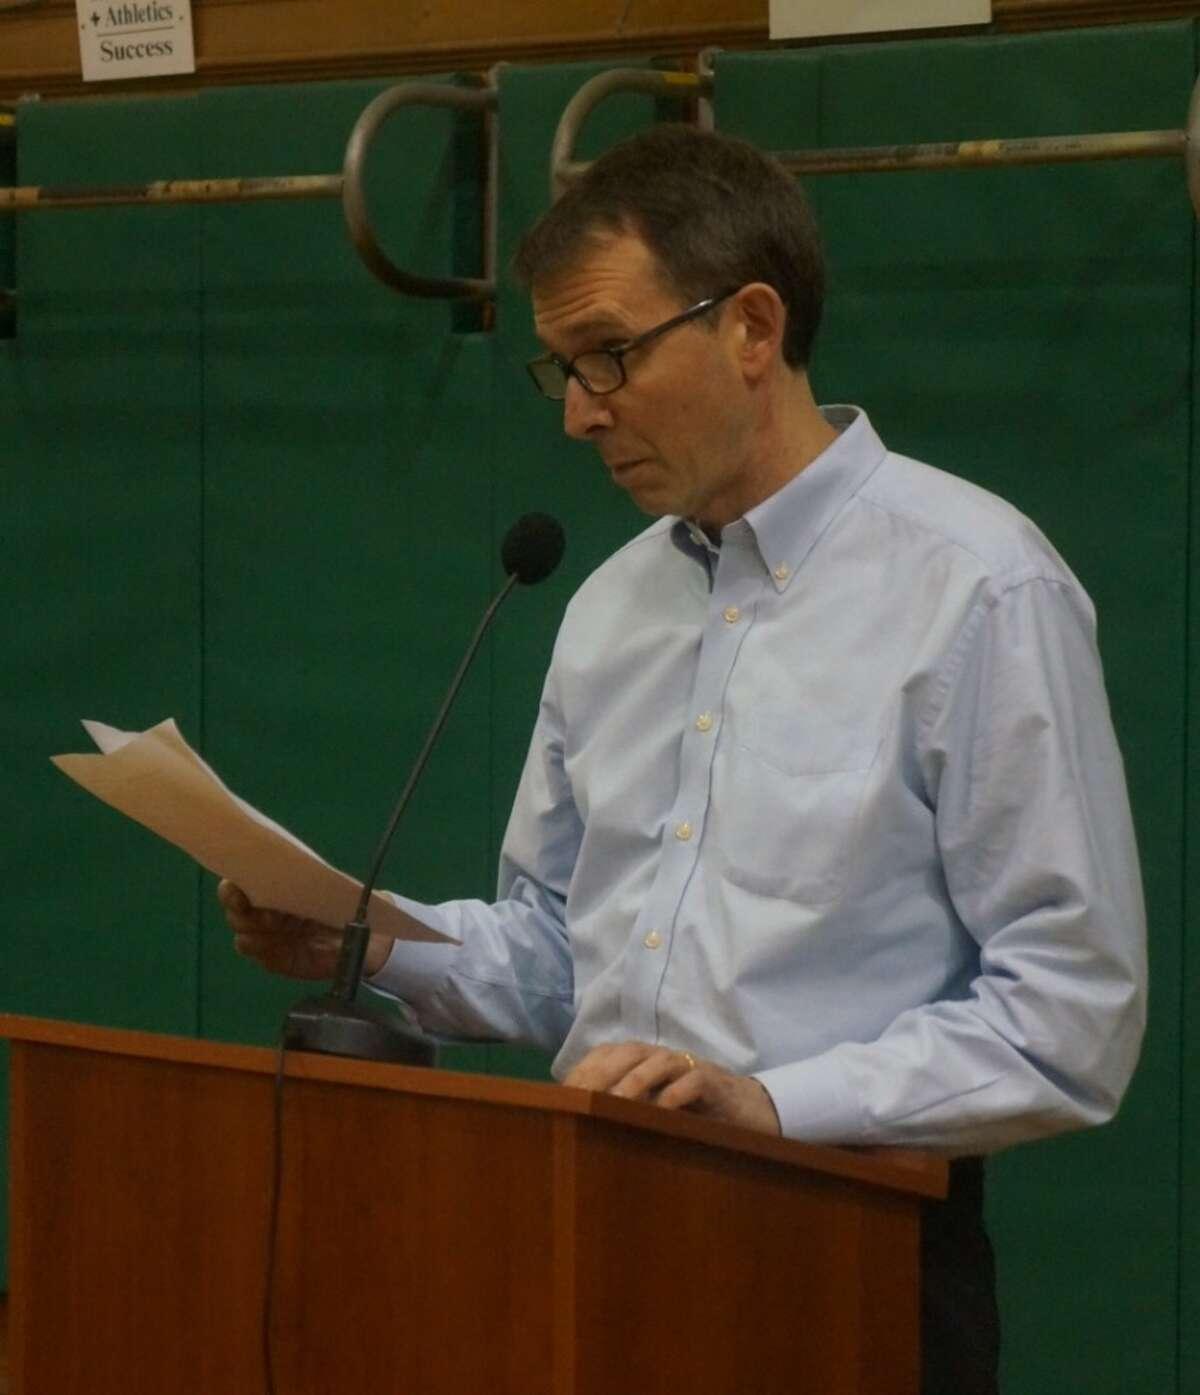 Wheatleigh Dunham speaks at Thursday's Board of Education meeting at Julian Curtiss School